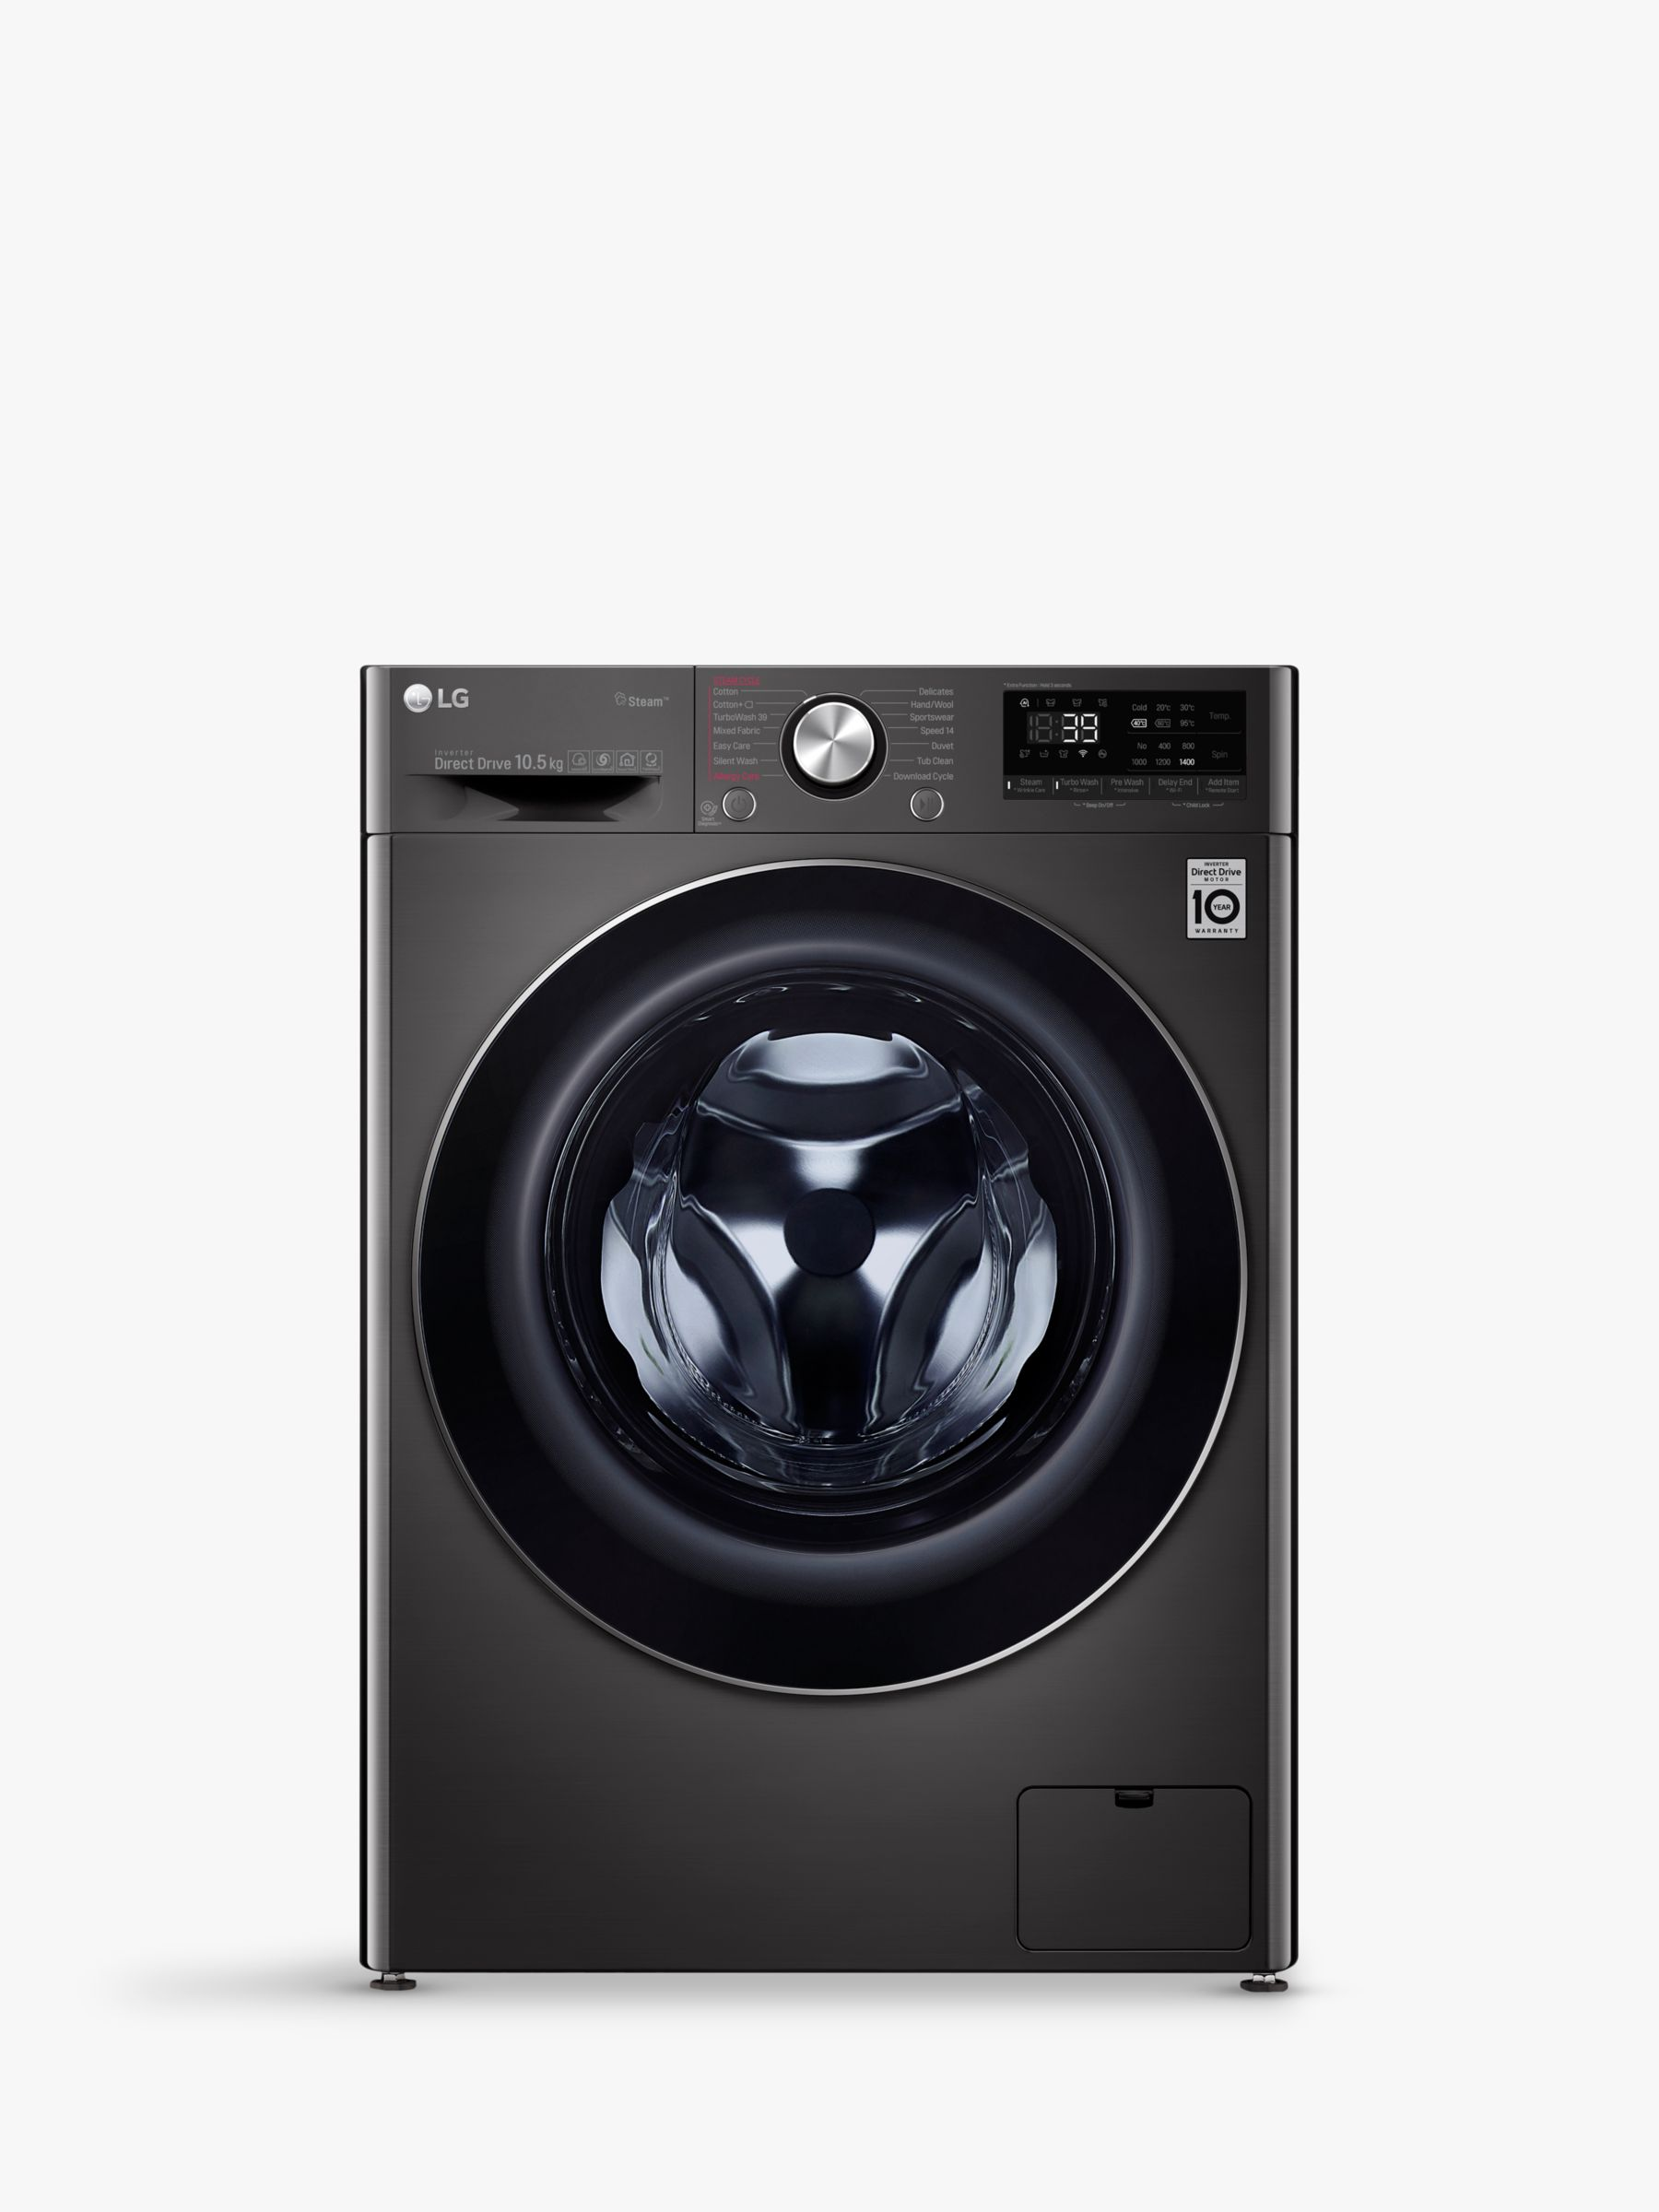 LG LG F4V910BTS Freestanding Washing Machine, 10kg Load, A+++ Energy Rating, 1400rpm Spin, Black